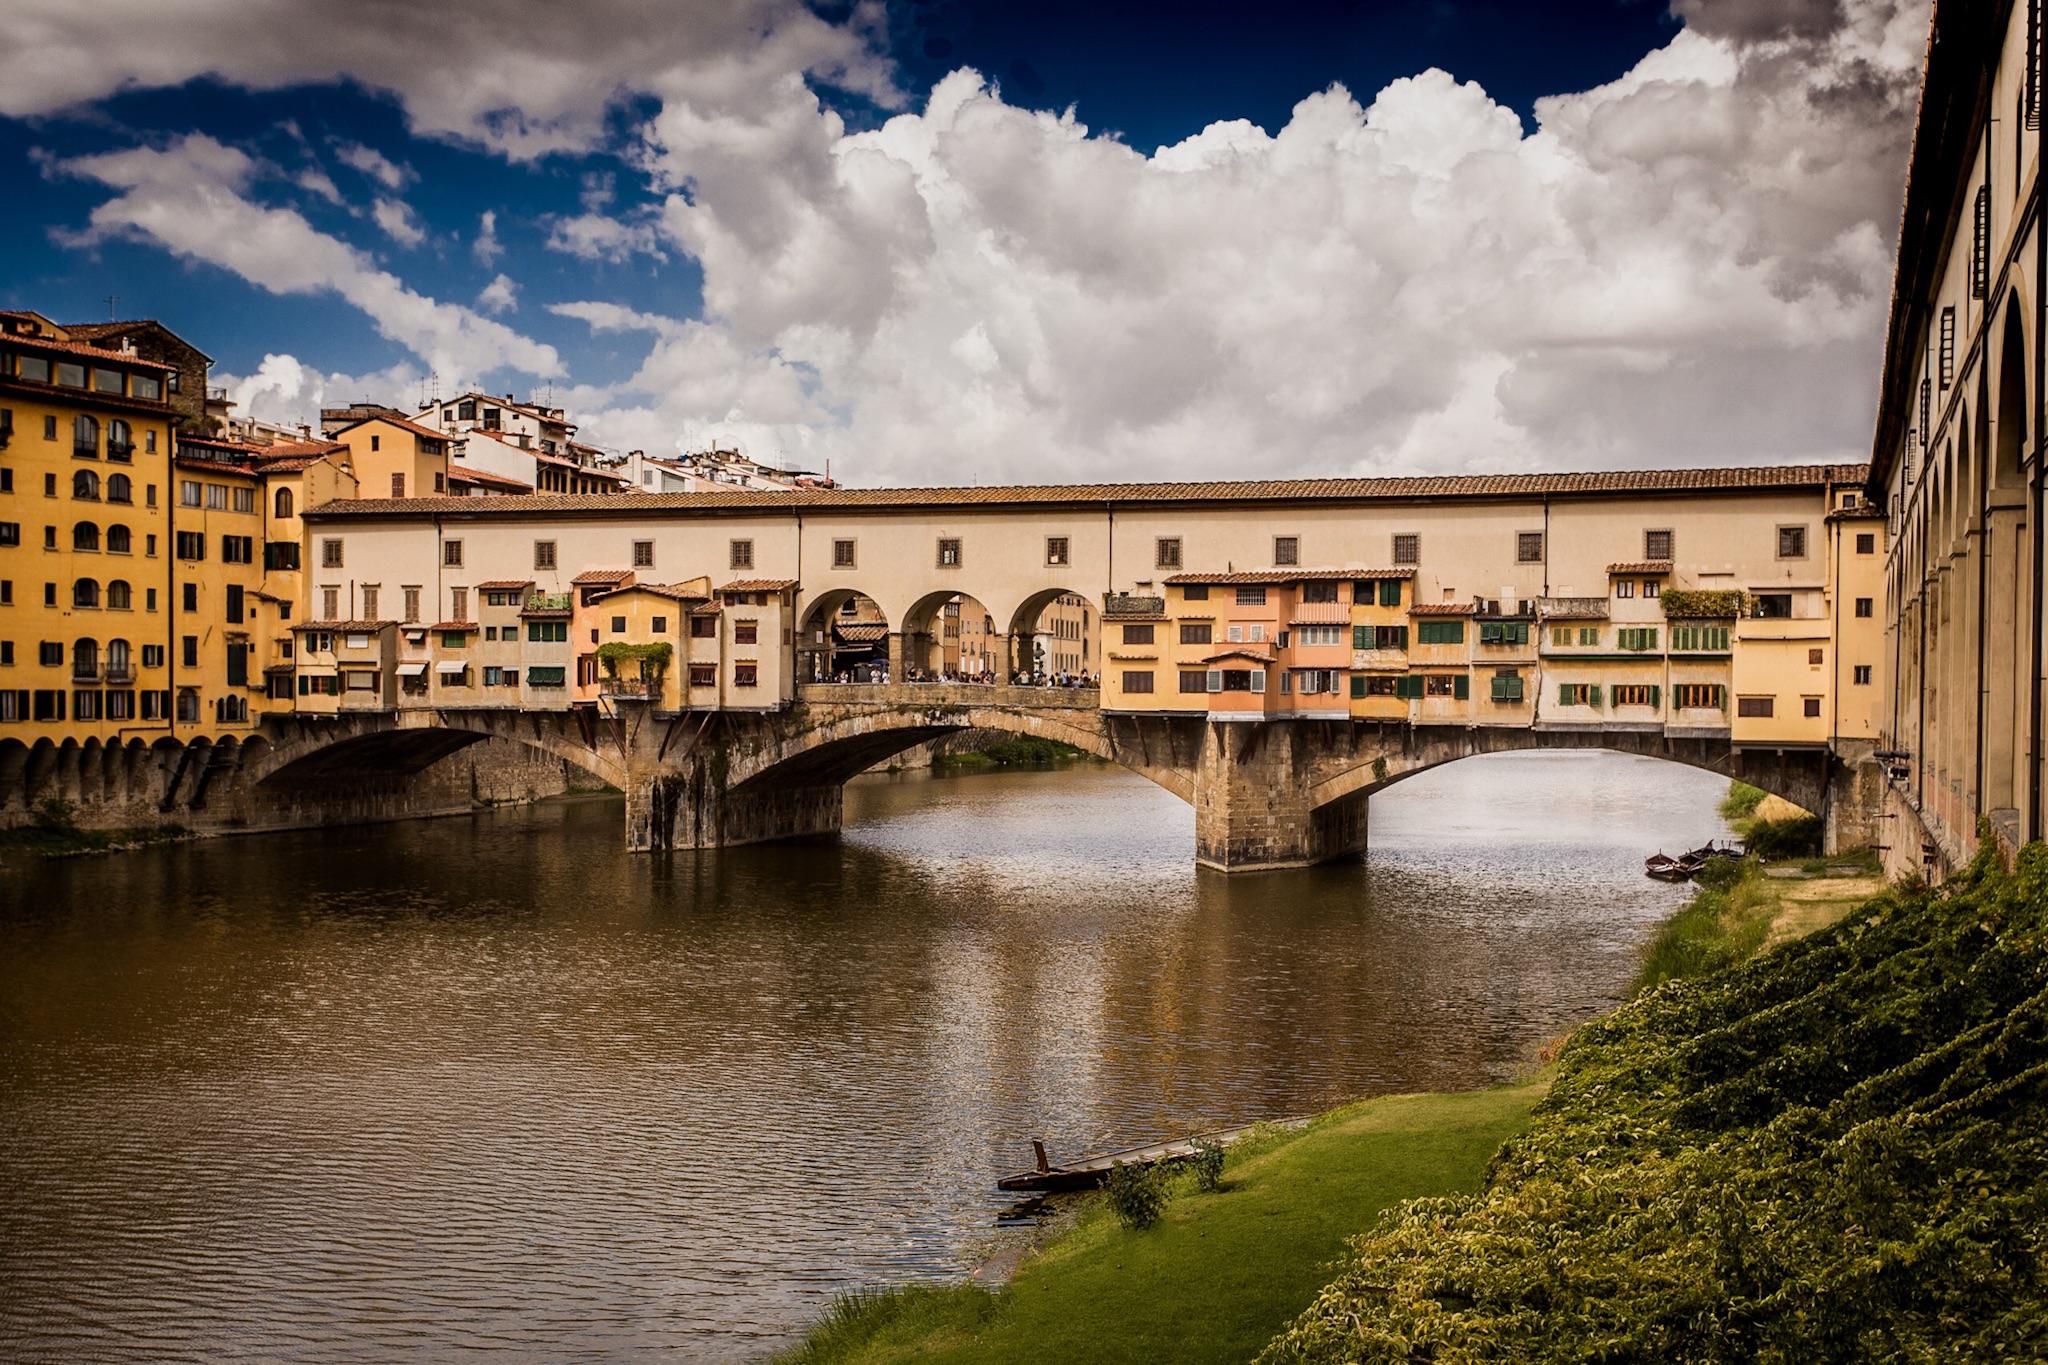 Ponte Vecchio by architectural photographer Rick McEvoy